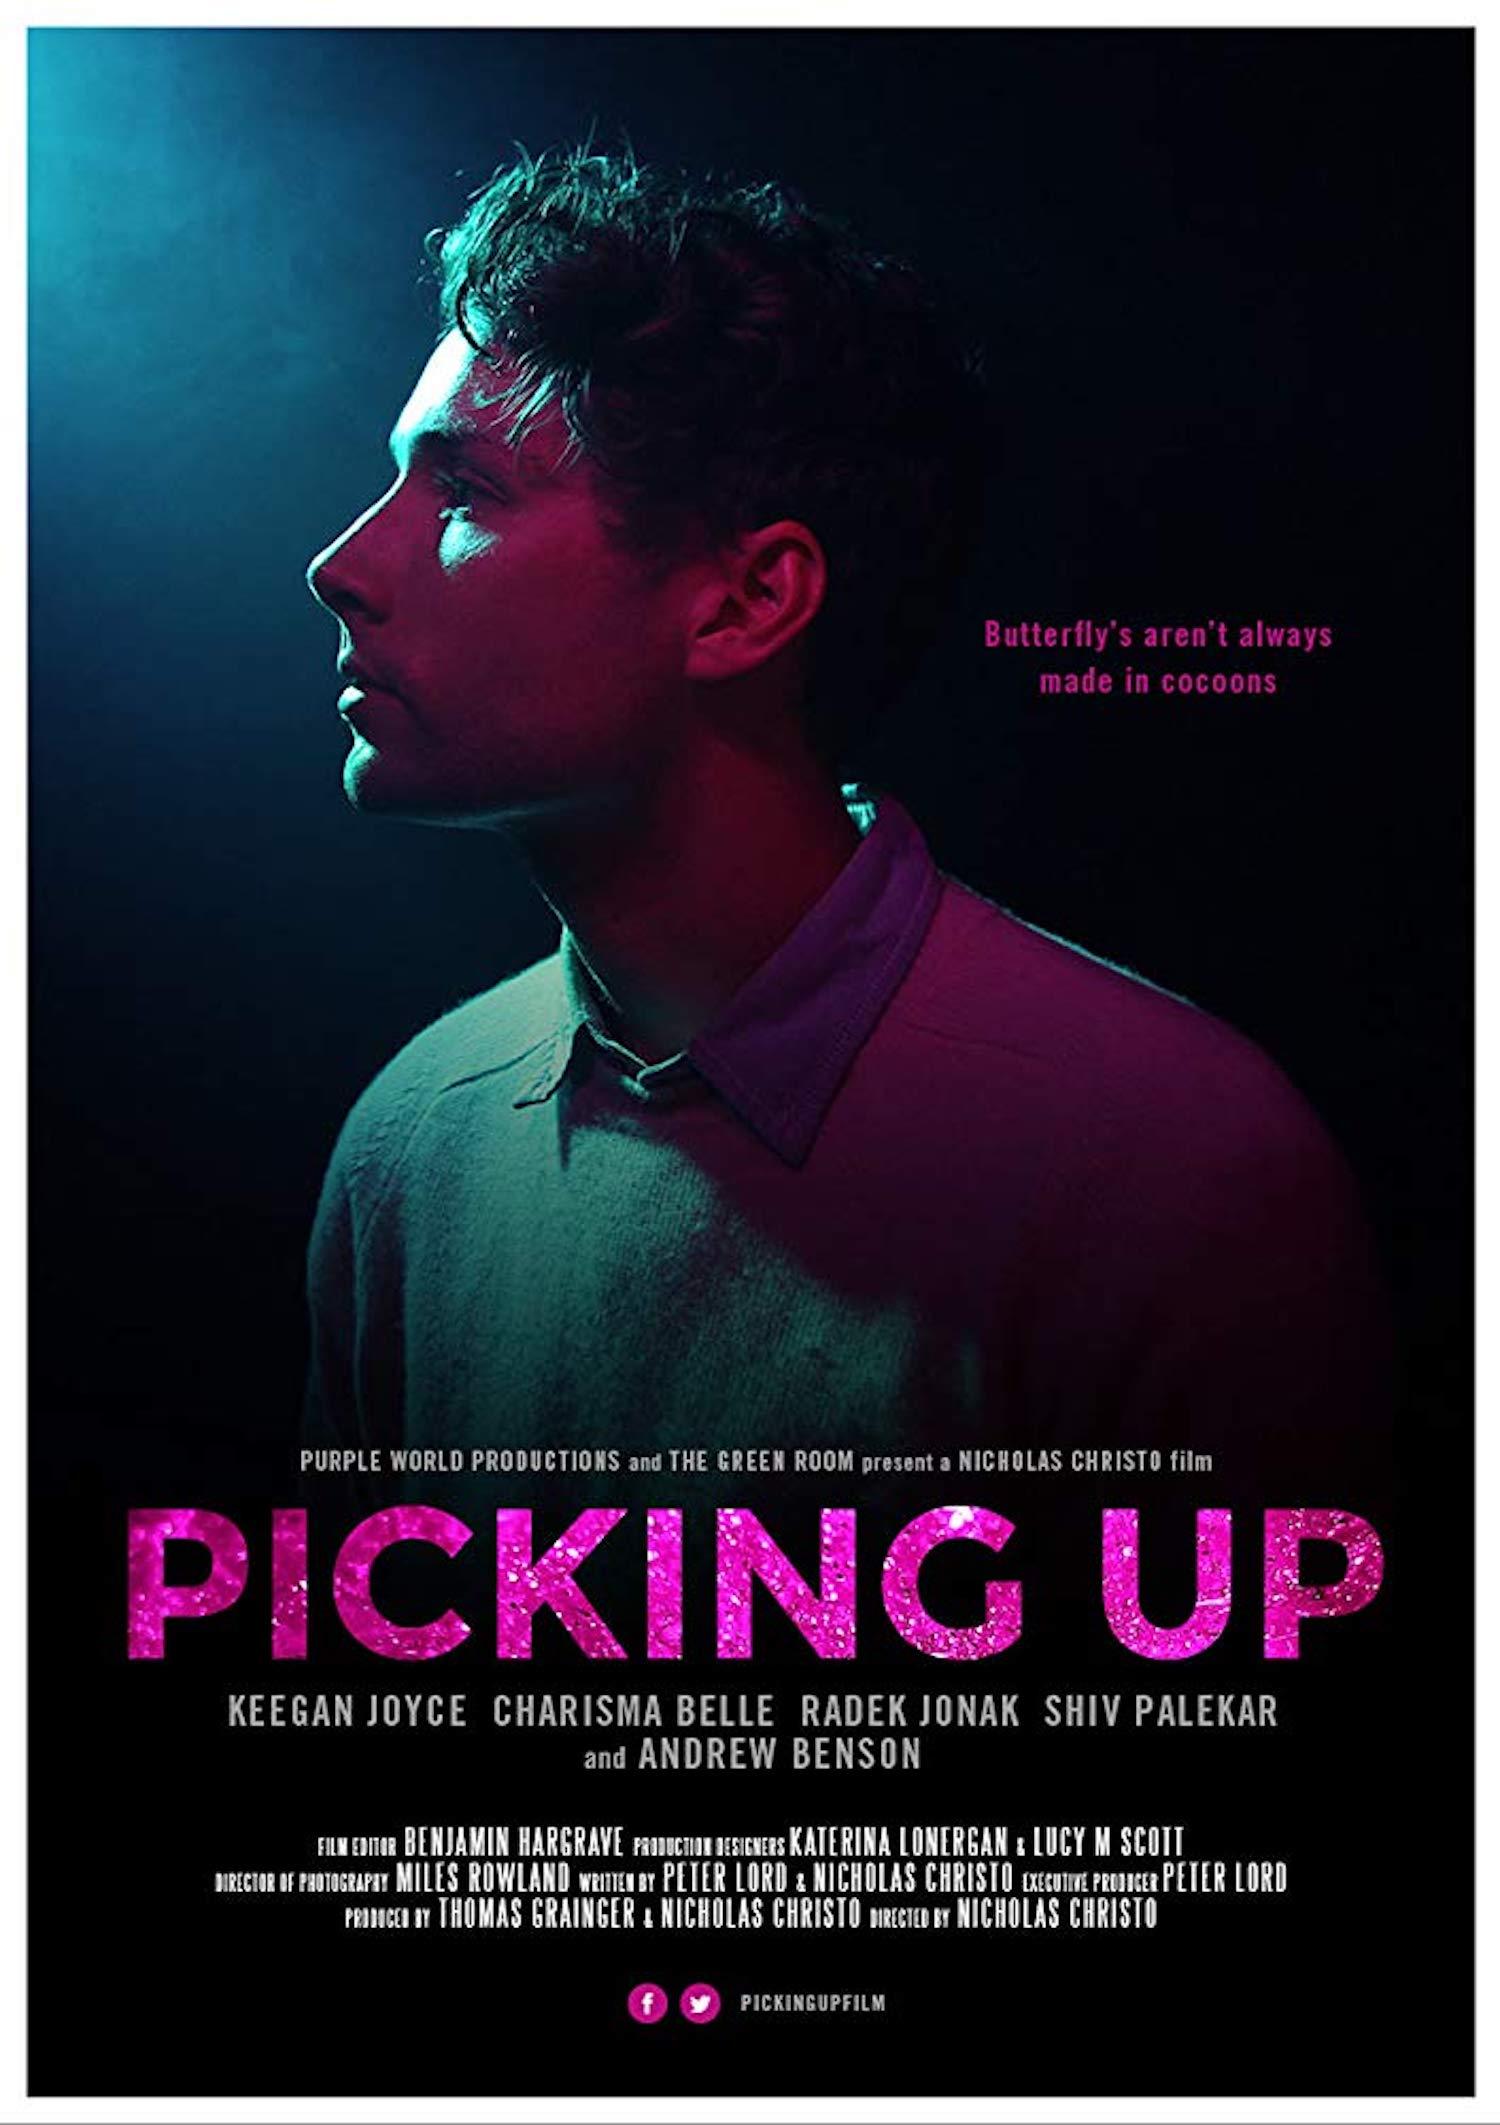 Charisma Belle stars alongside Keegan Joyce in short film,  Picking Up , directed by Nicholas Christo, produced by Thomas Grainger, Nicholas Christo & Peter Lord. Australia, (2016).